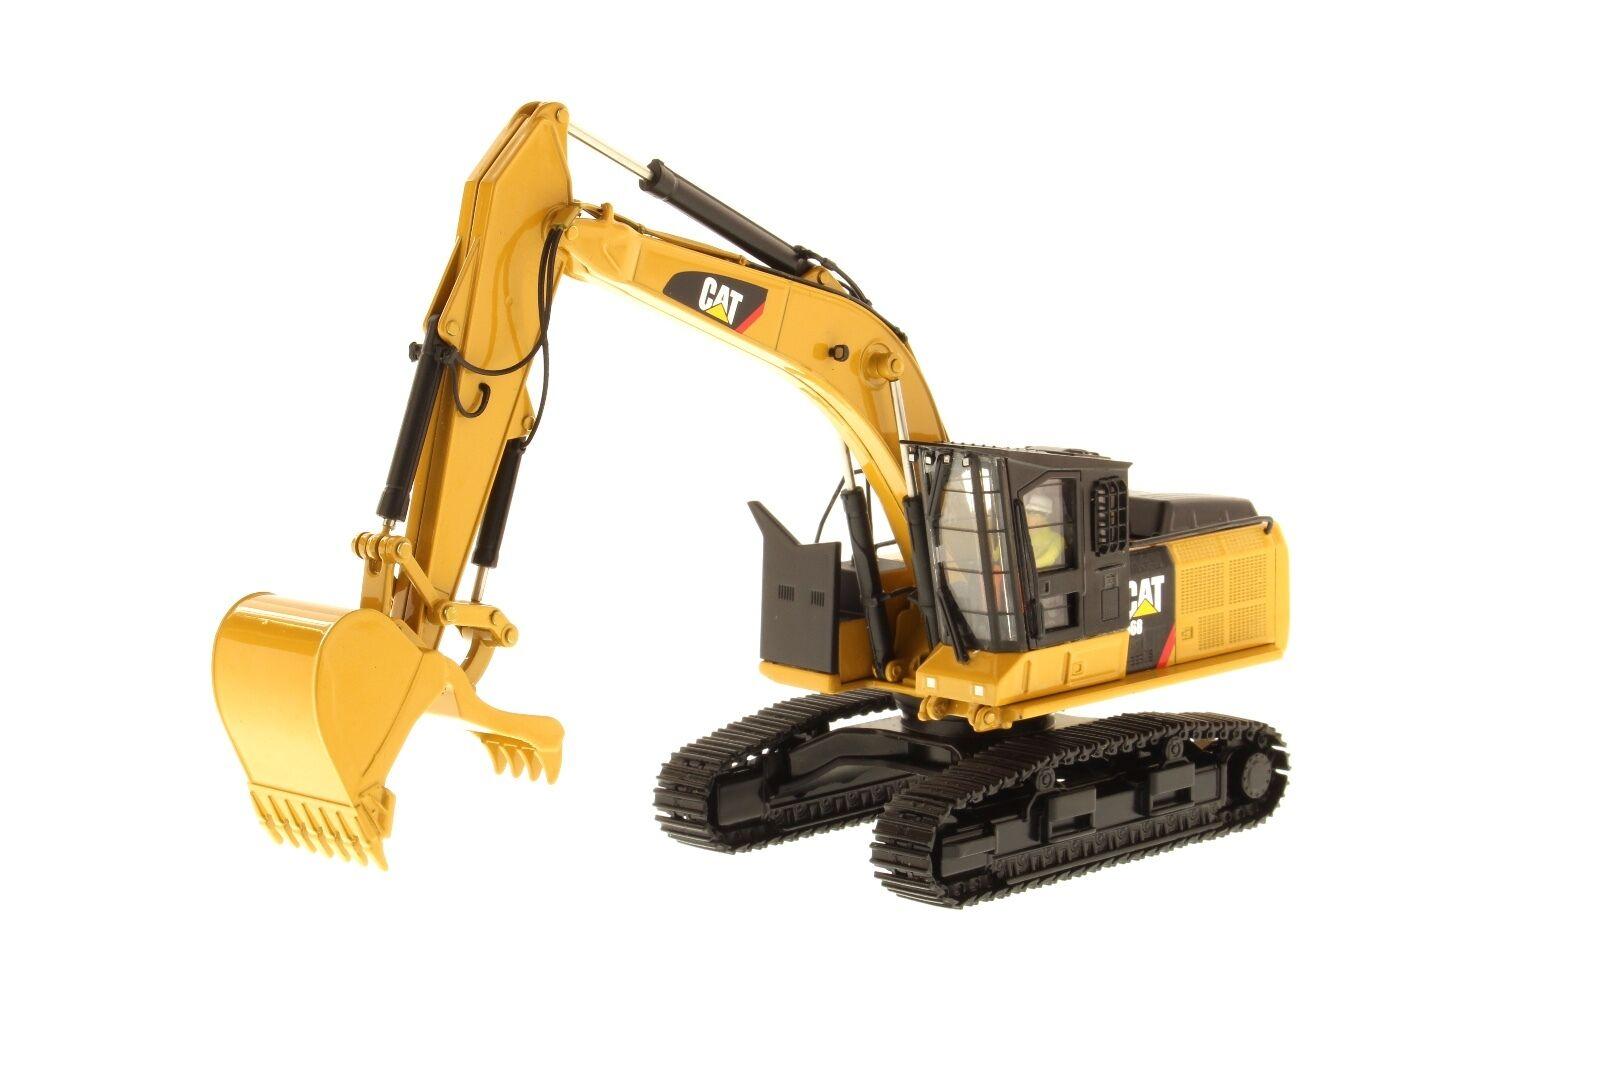 Caterpillar® 1 50 scale Cat  568 Road Builder Configuration - 85923 DM  remise